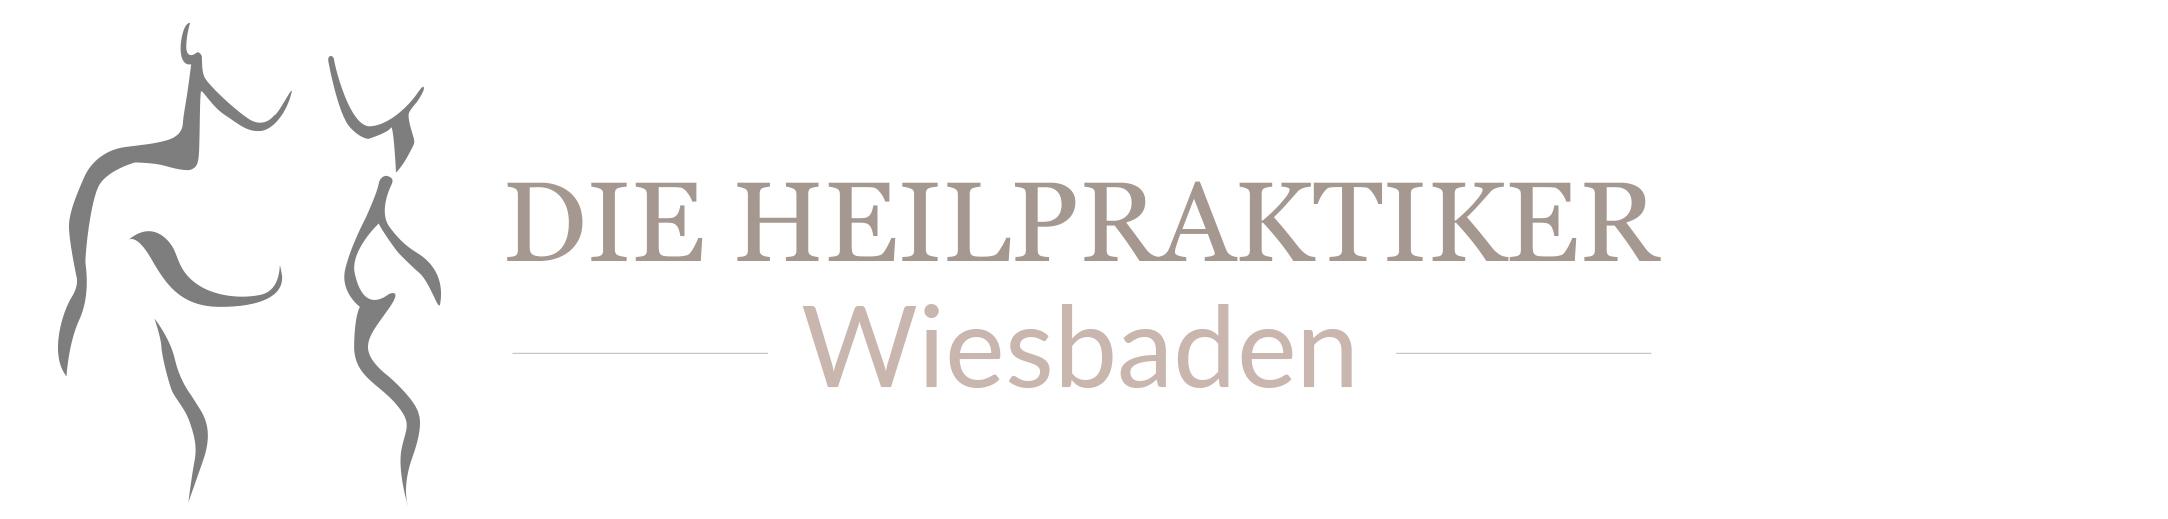 Heilpraktiker Wiesbaden Logo